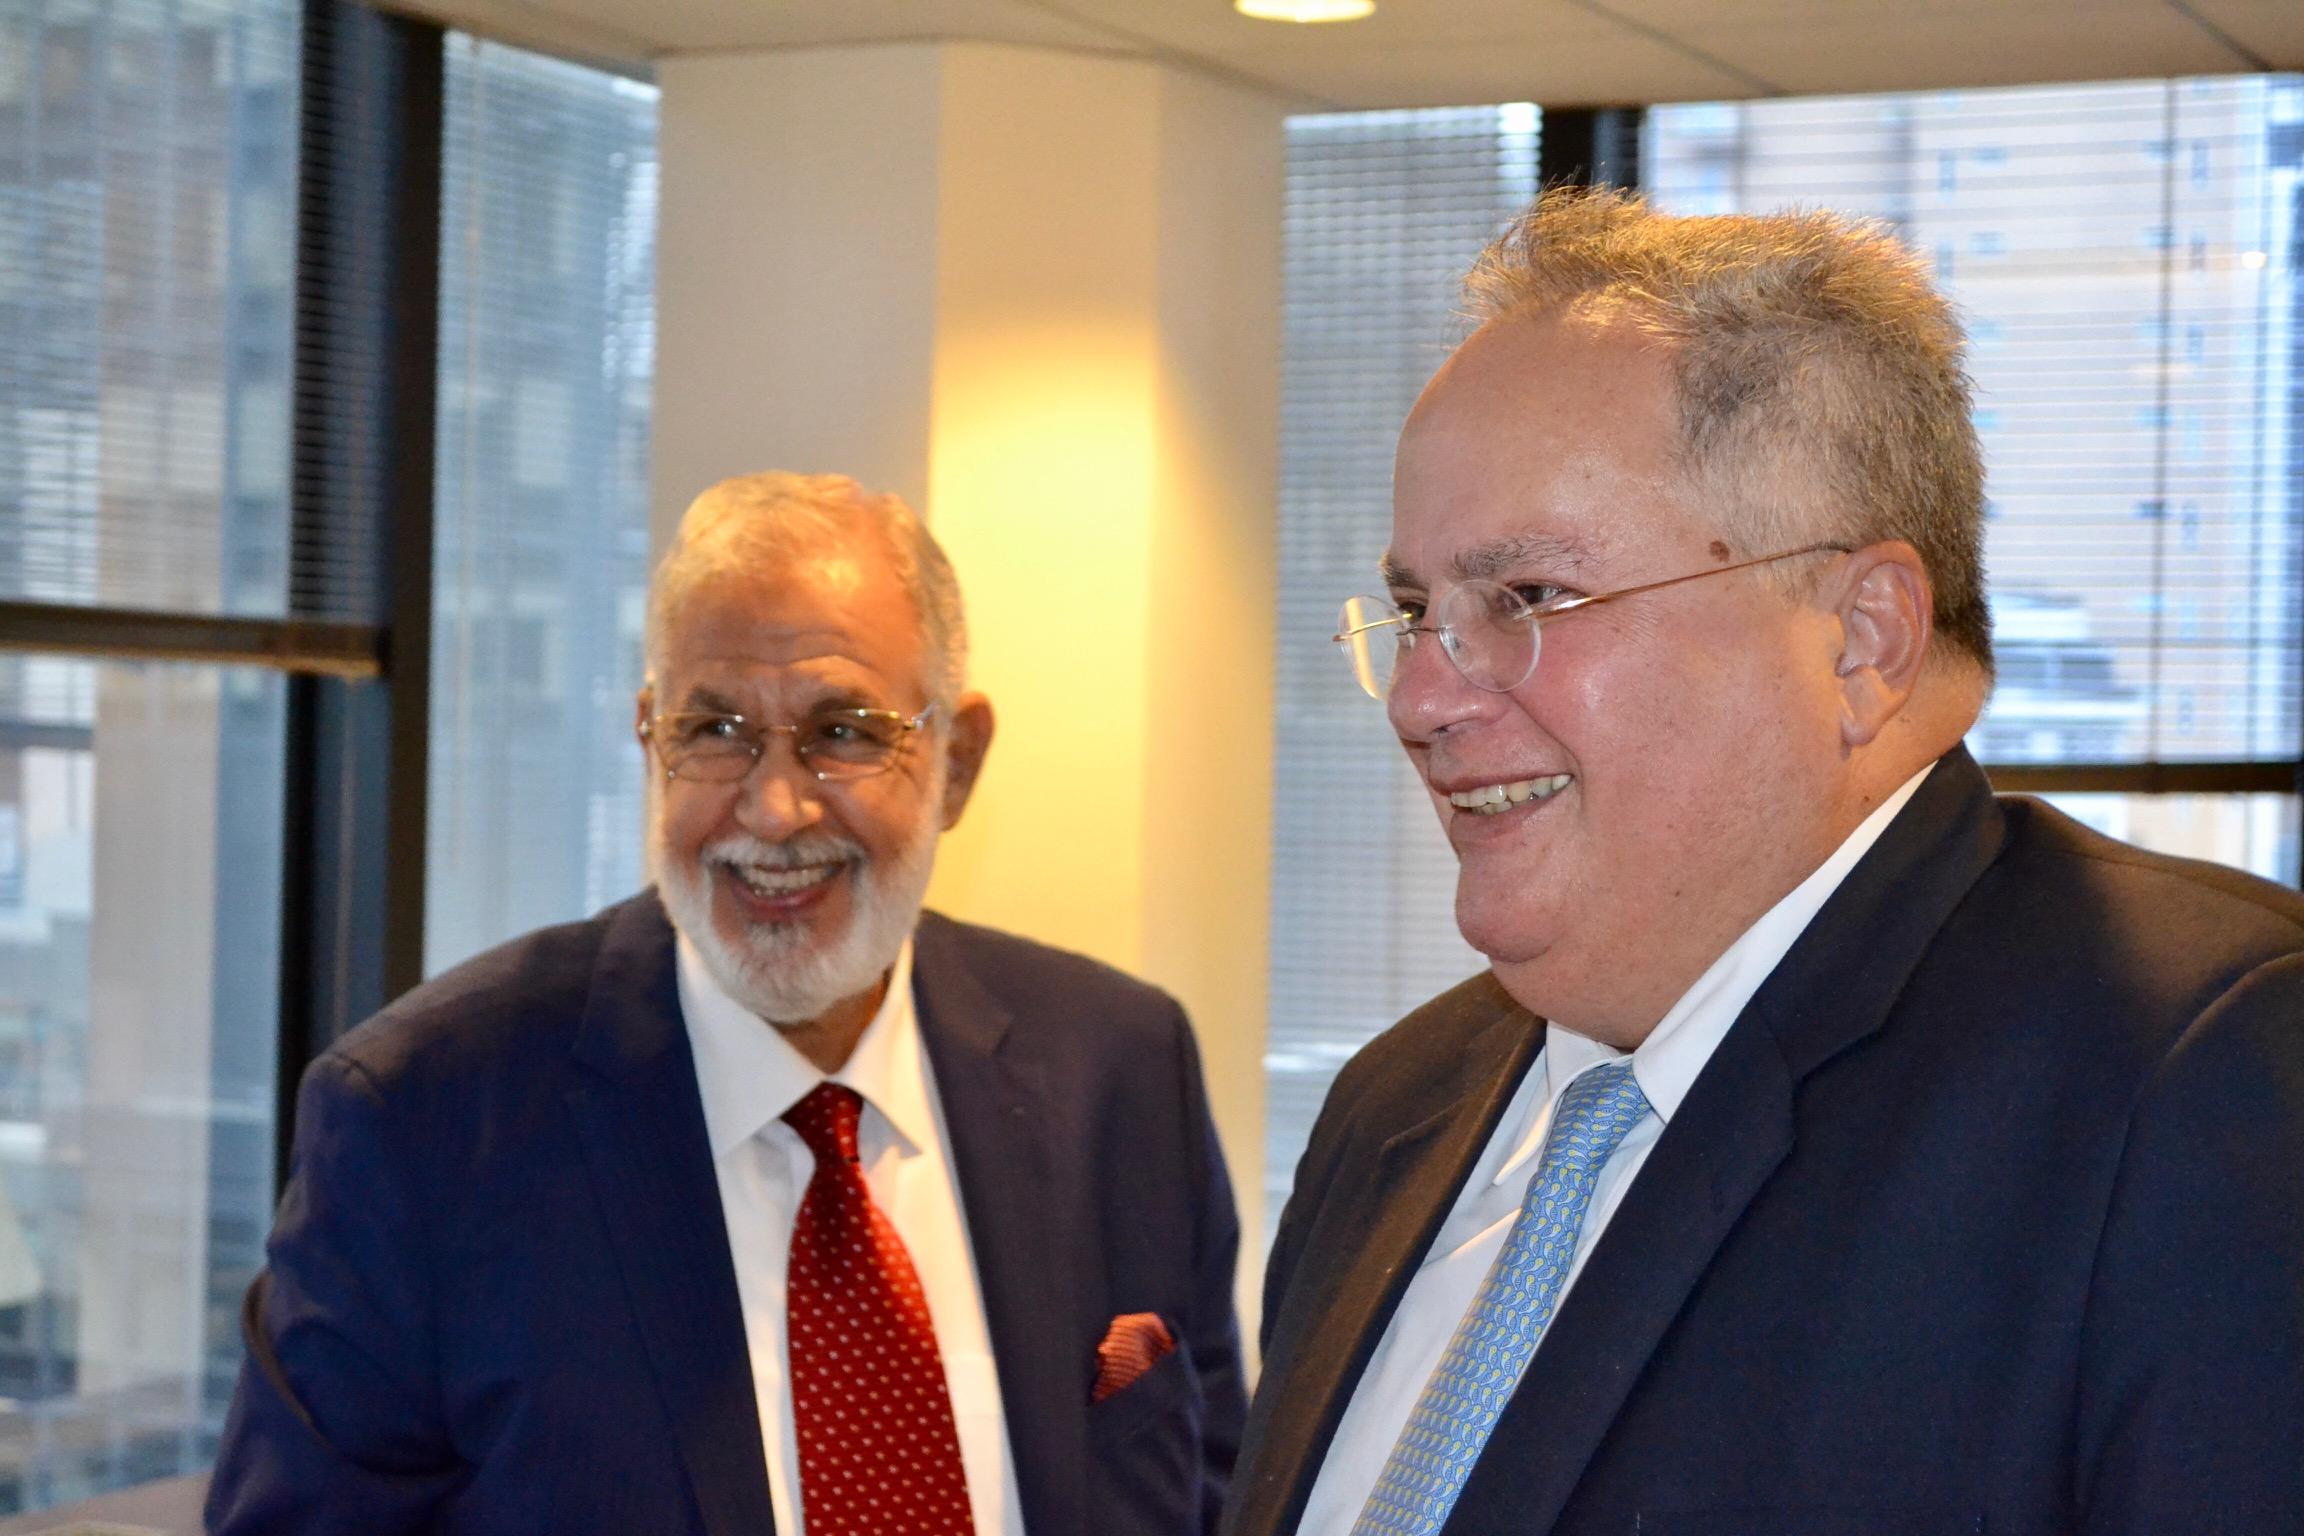 N. Kotzias has meeting with Libyan counterpart Mohamed Taha Siala in New York